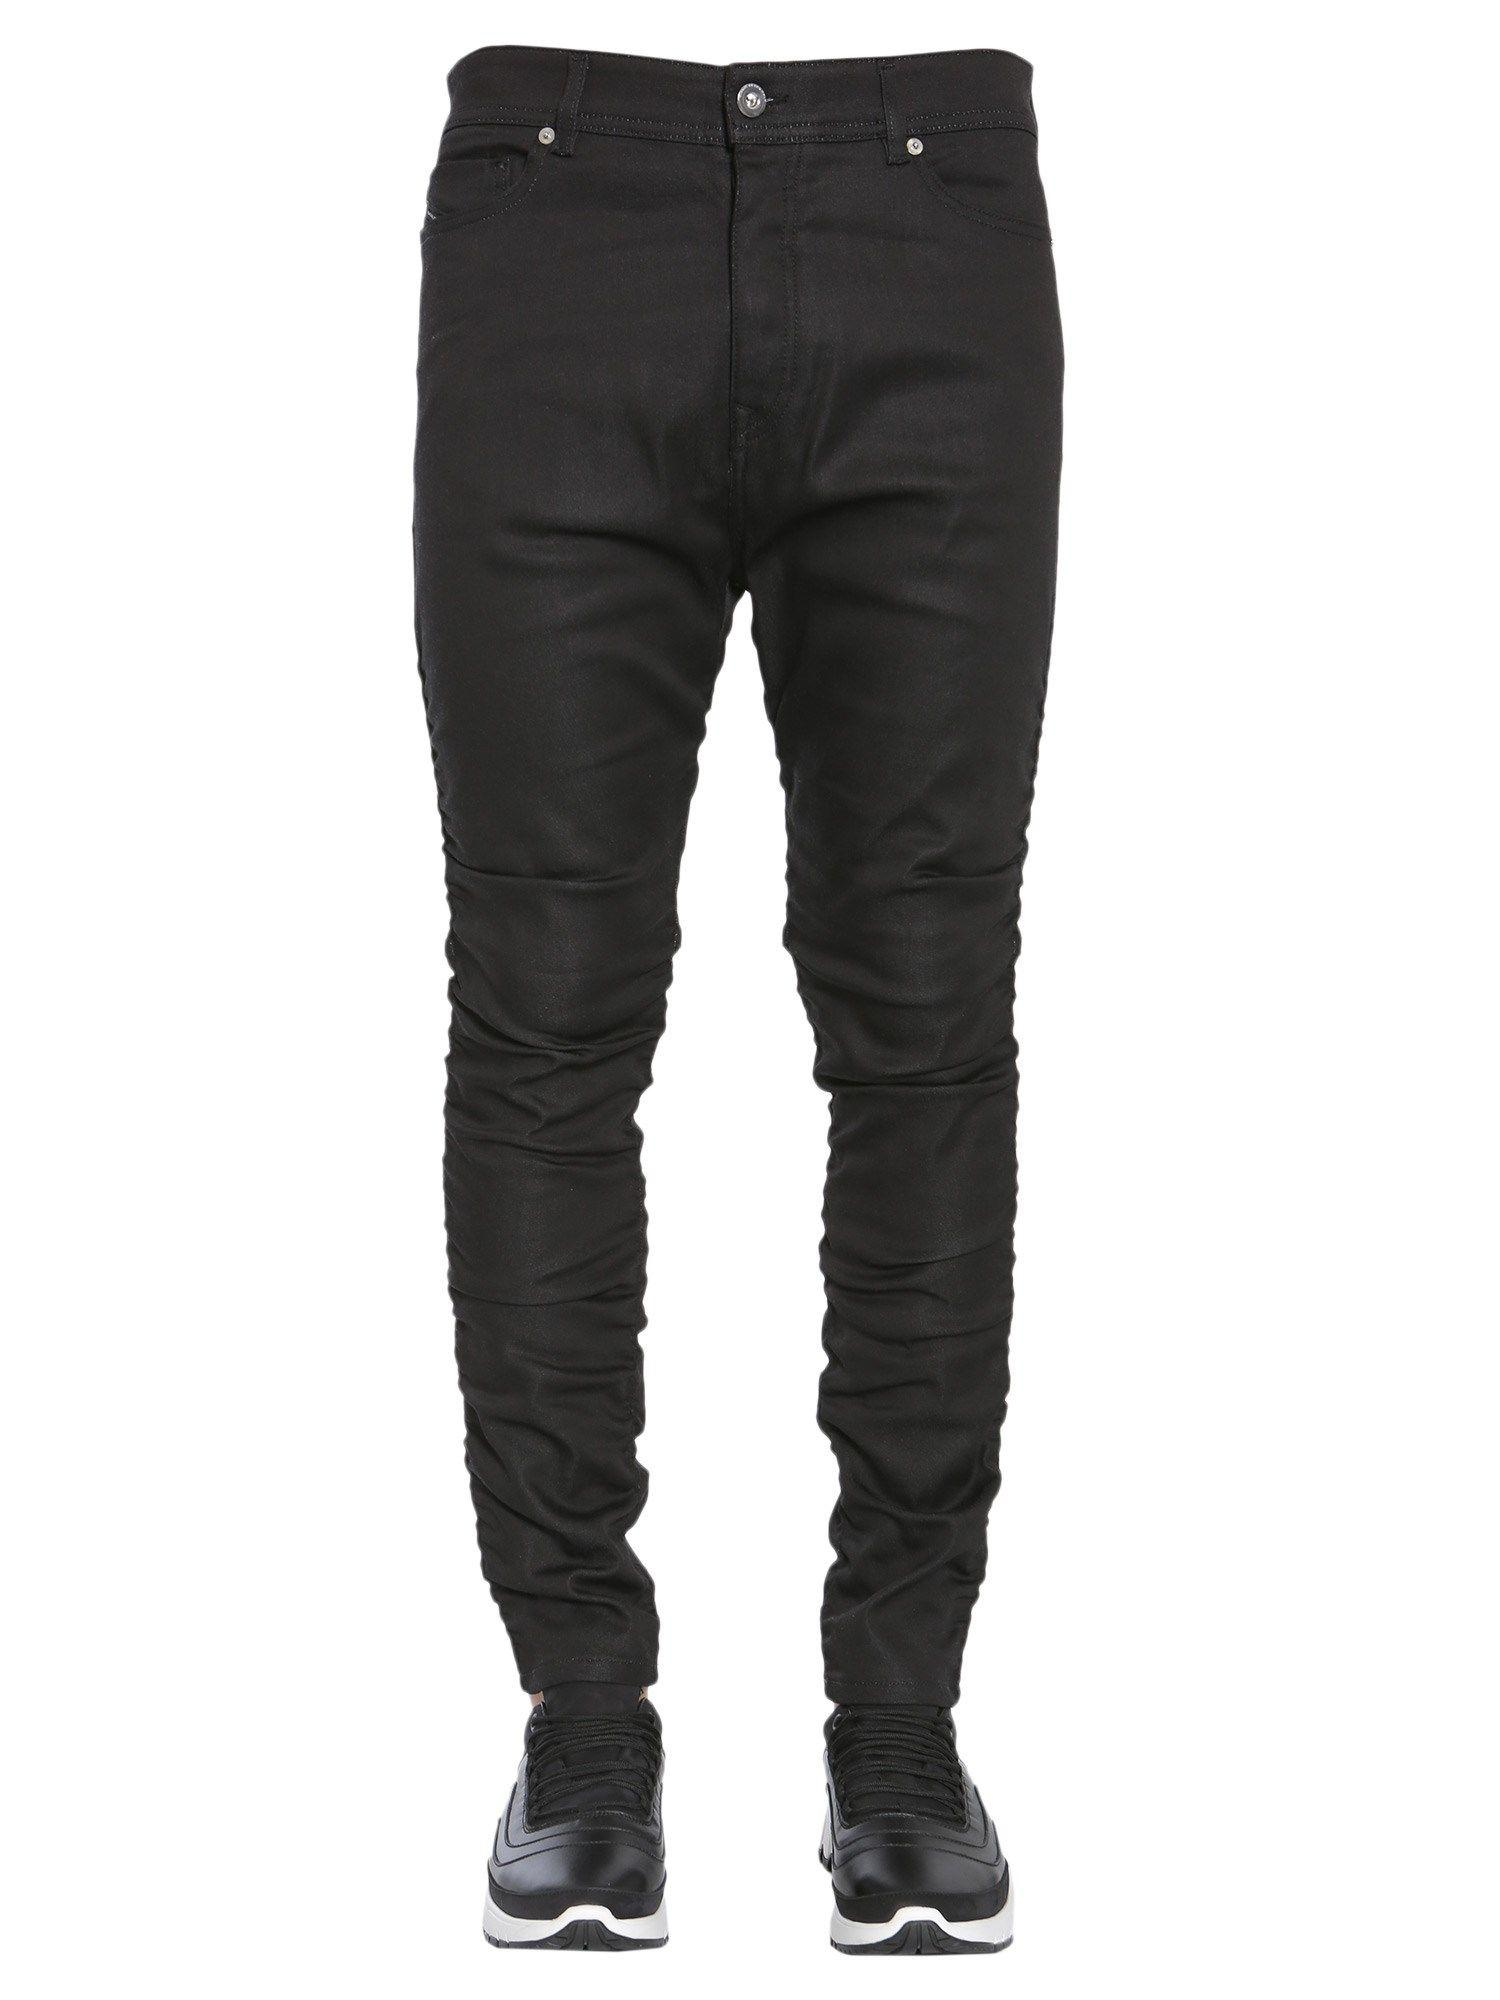 Diesel Black Gold Type-2759 Jeans In Nero